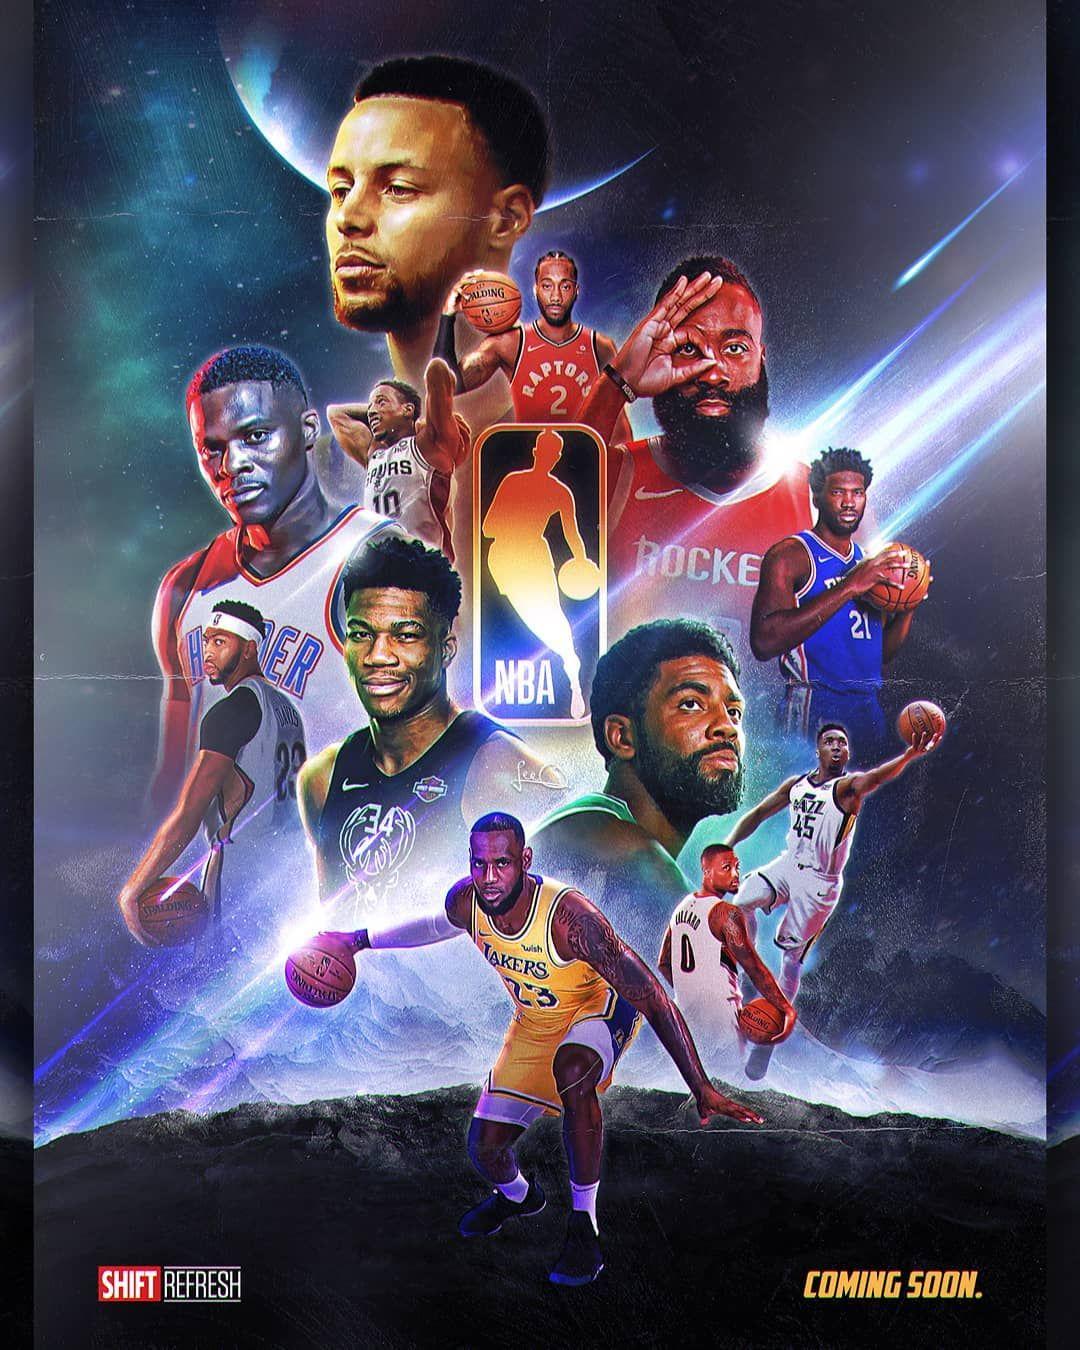 Not Long Now Having Fun With This Marvel Avengers Style Nba Poster Nbaart Nba Basketball Art Nba Wallpapers Nba Art